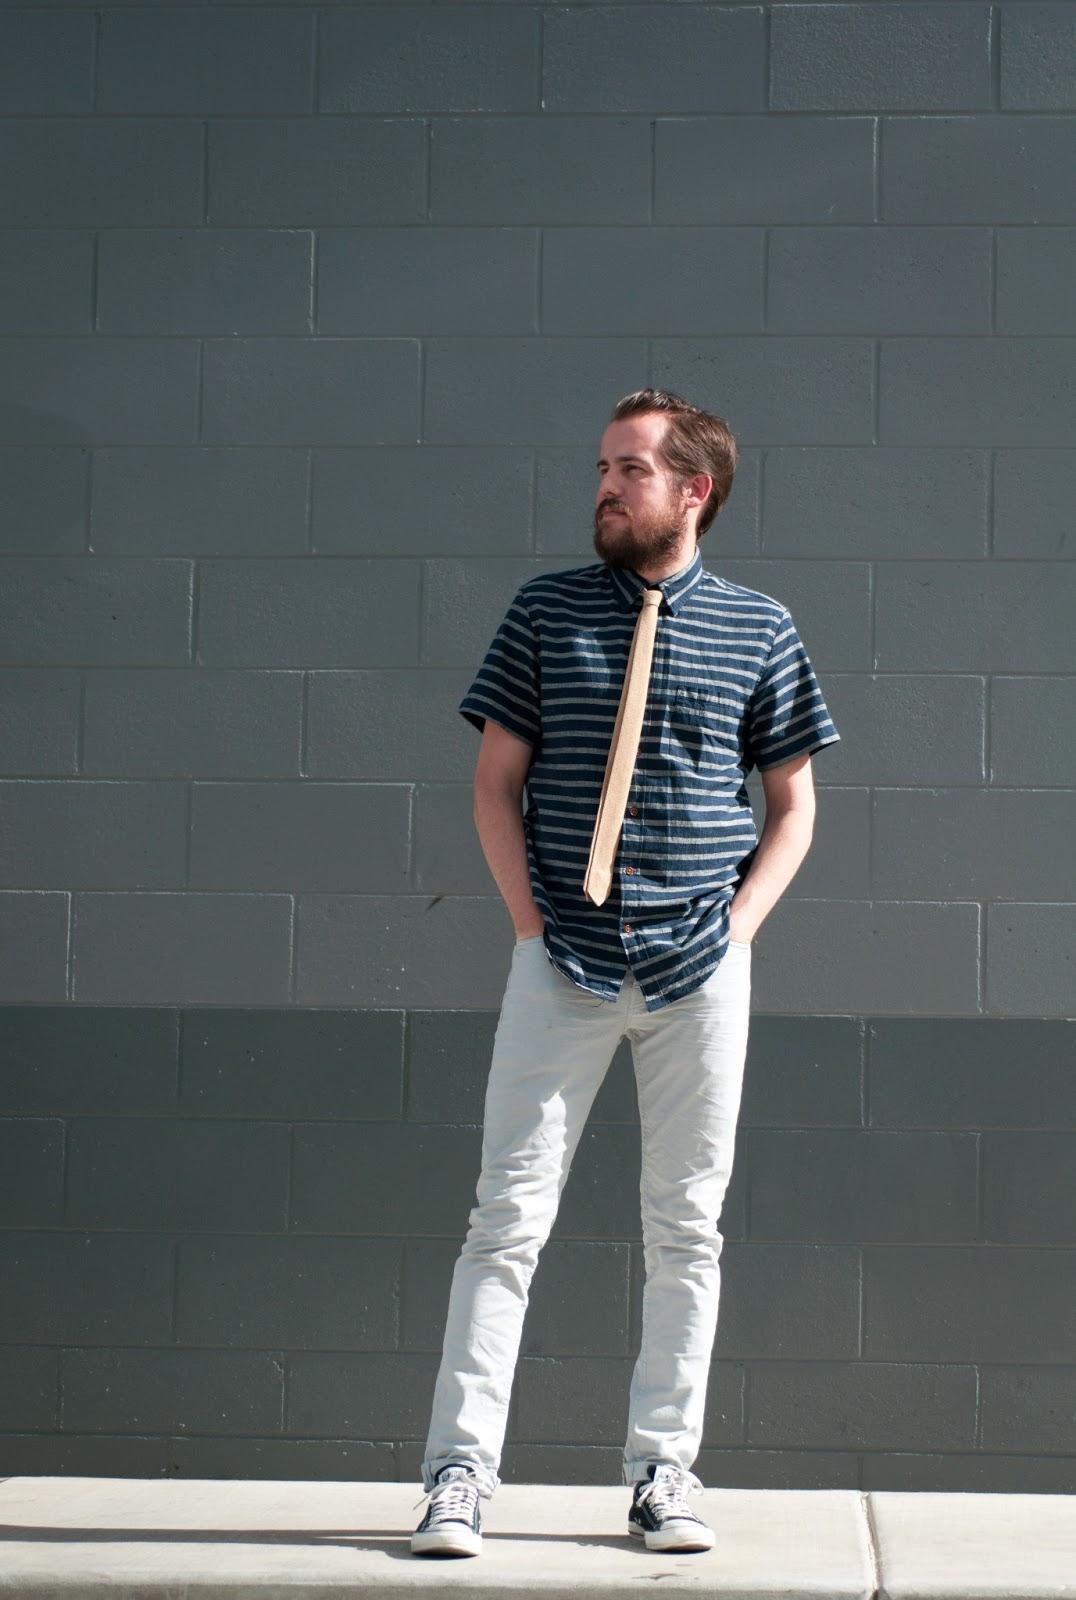 mens style blog, mens fashion blog, all saints, jcrew, ootd, skinny tie, ootd